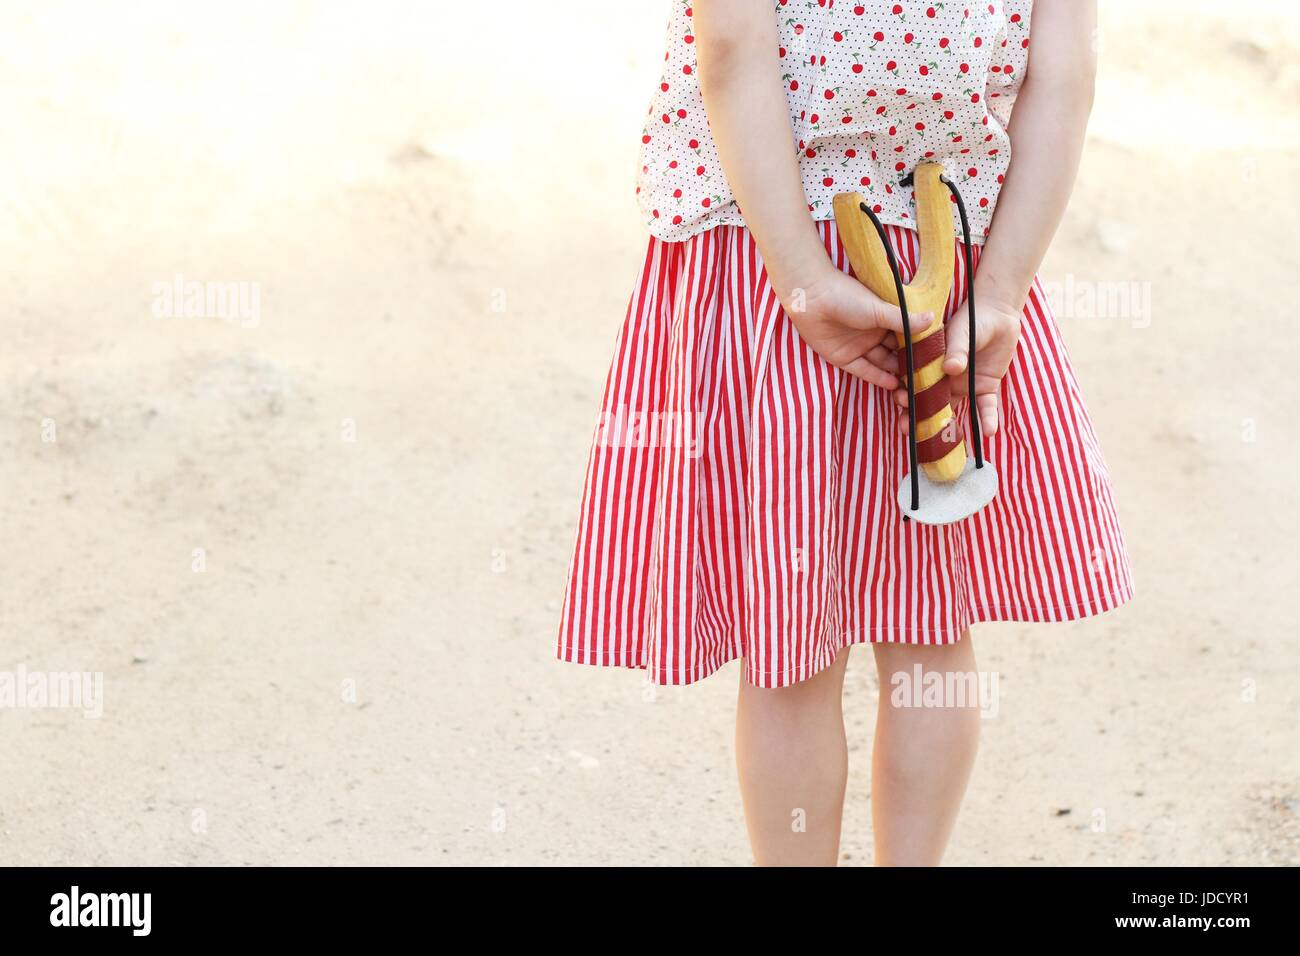 Girl holding a slingshot in her hands Girl holding a slingshot in her hands - Stock Image